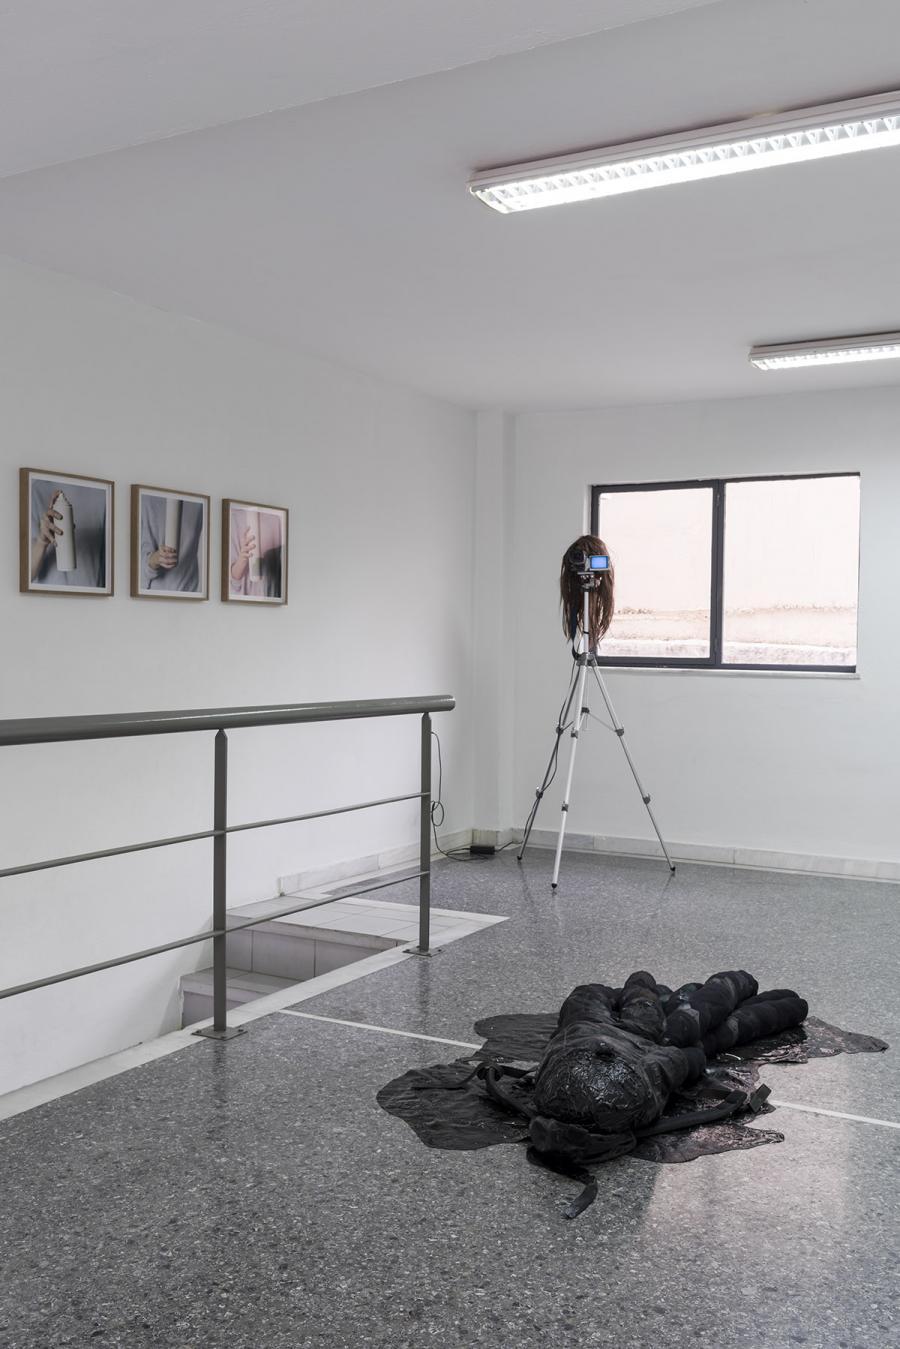 """moi non-moi"" or ""carrying owls to athens"", Ausstellungsansicht: Kerstin von Gabain, Albert Mayr, Victor Lizana (Foto: Simon Veres)"